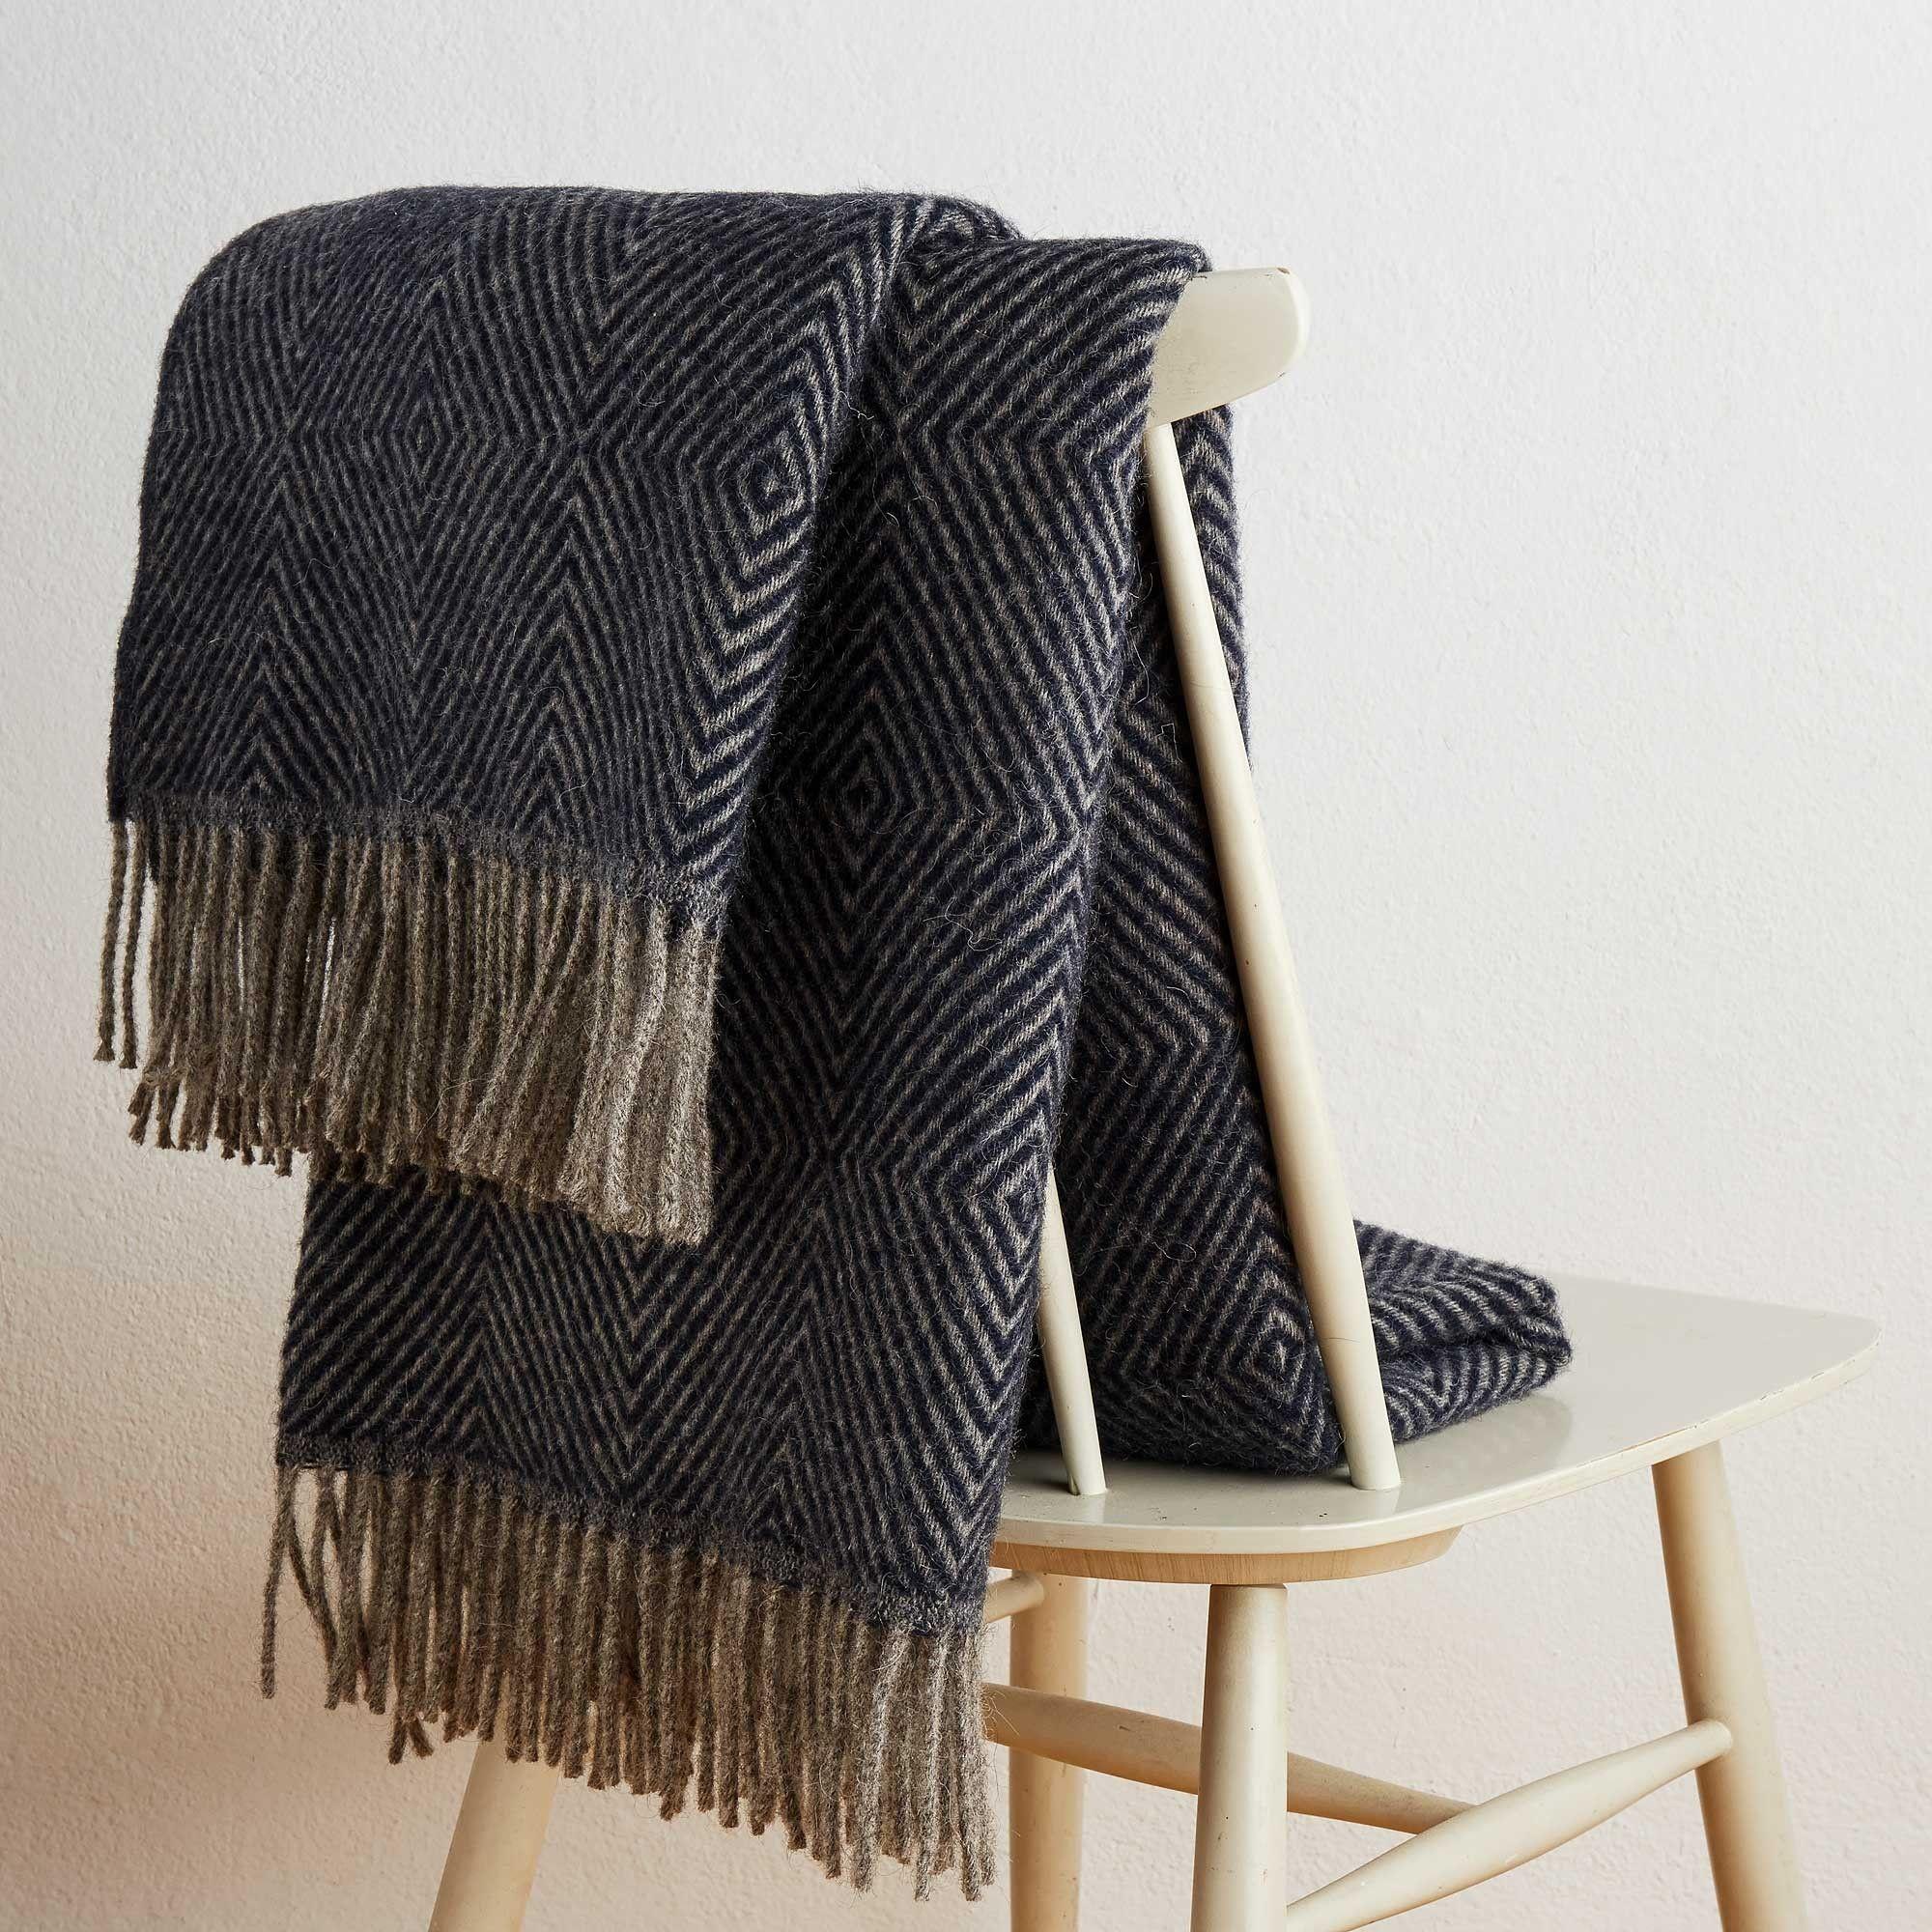 Wolldecke Gotland Wolldecke Blaue Decke Und Blau Grau